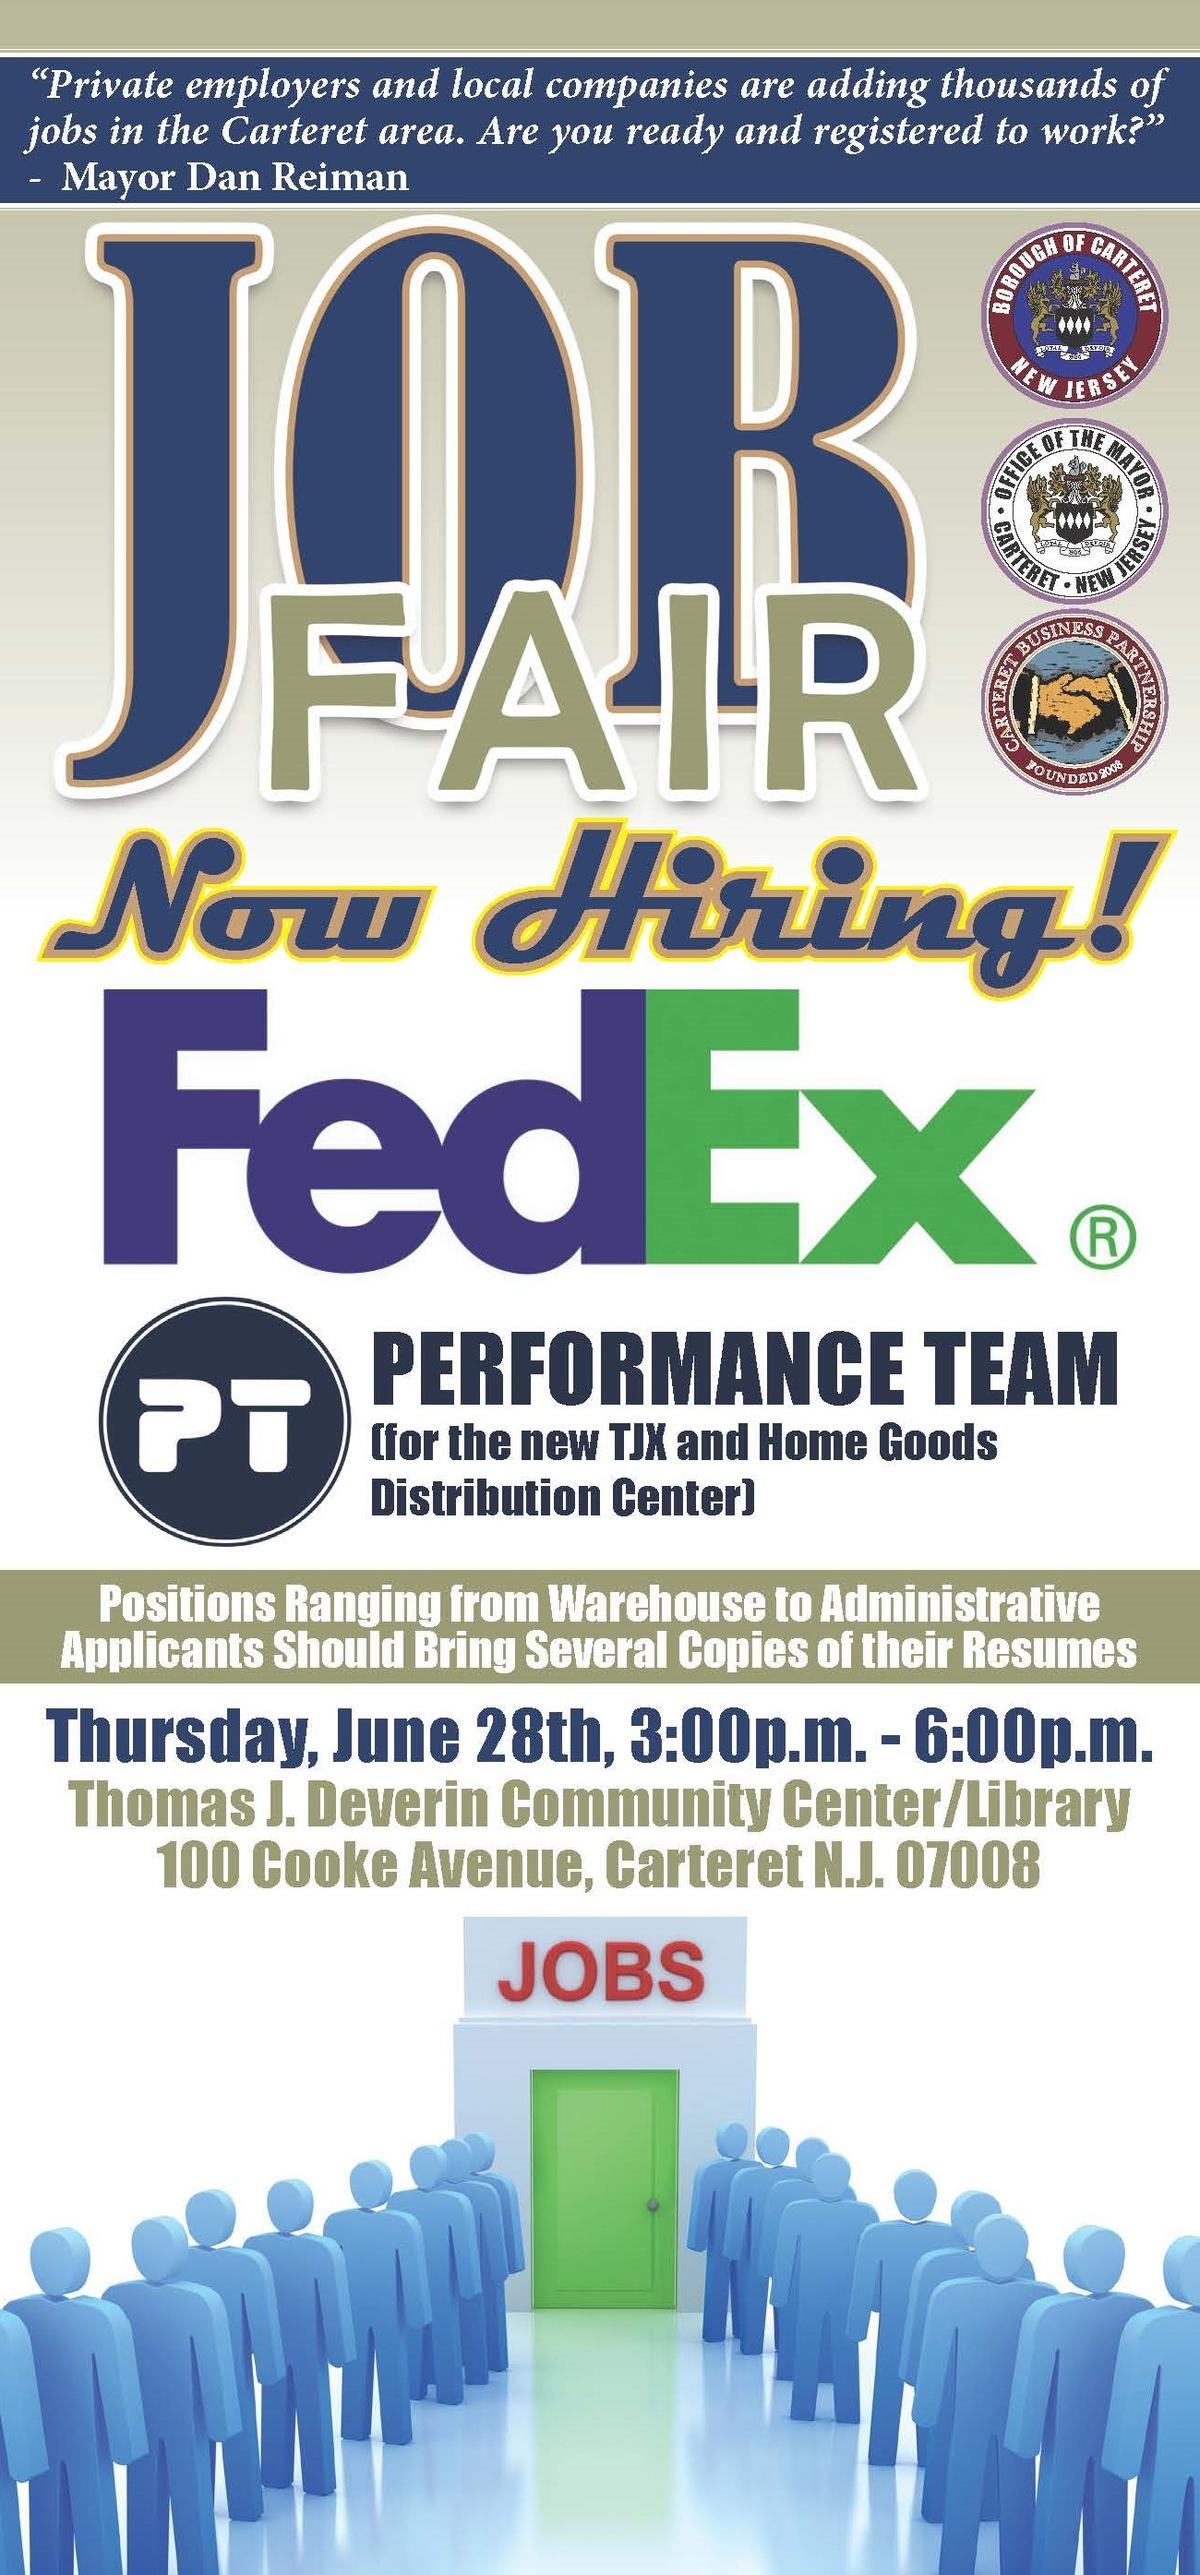 fedex homegoods tj maxx job fair in carteret june 28 woodbridge